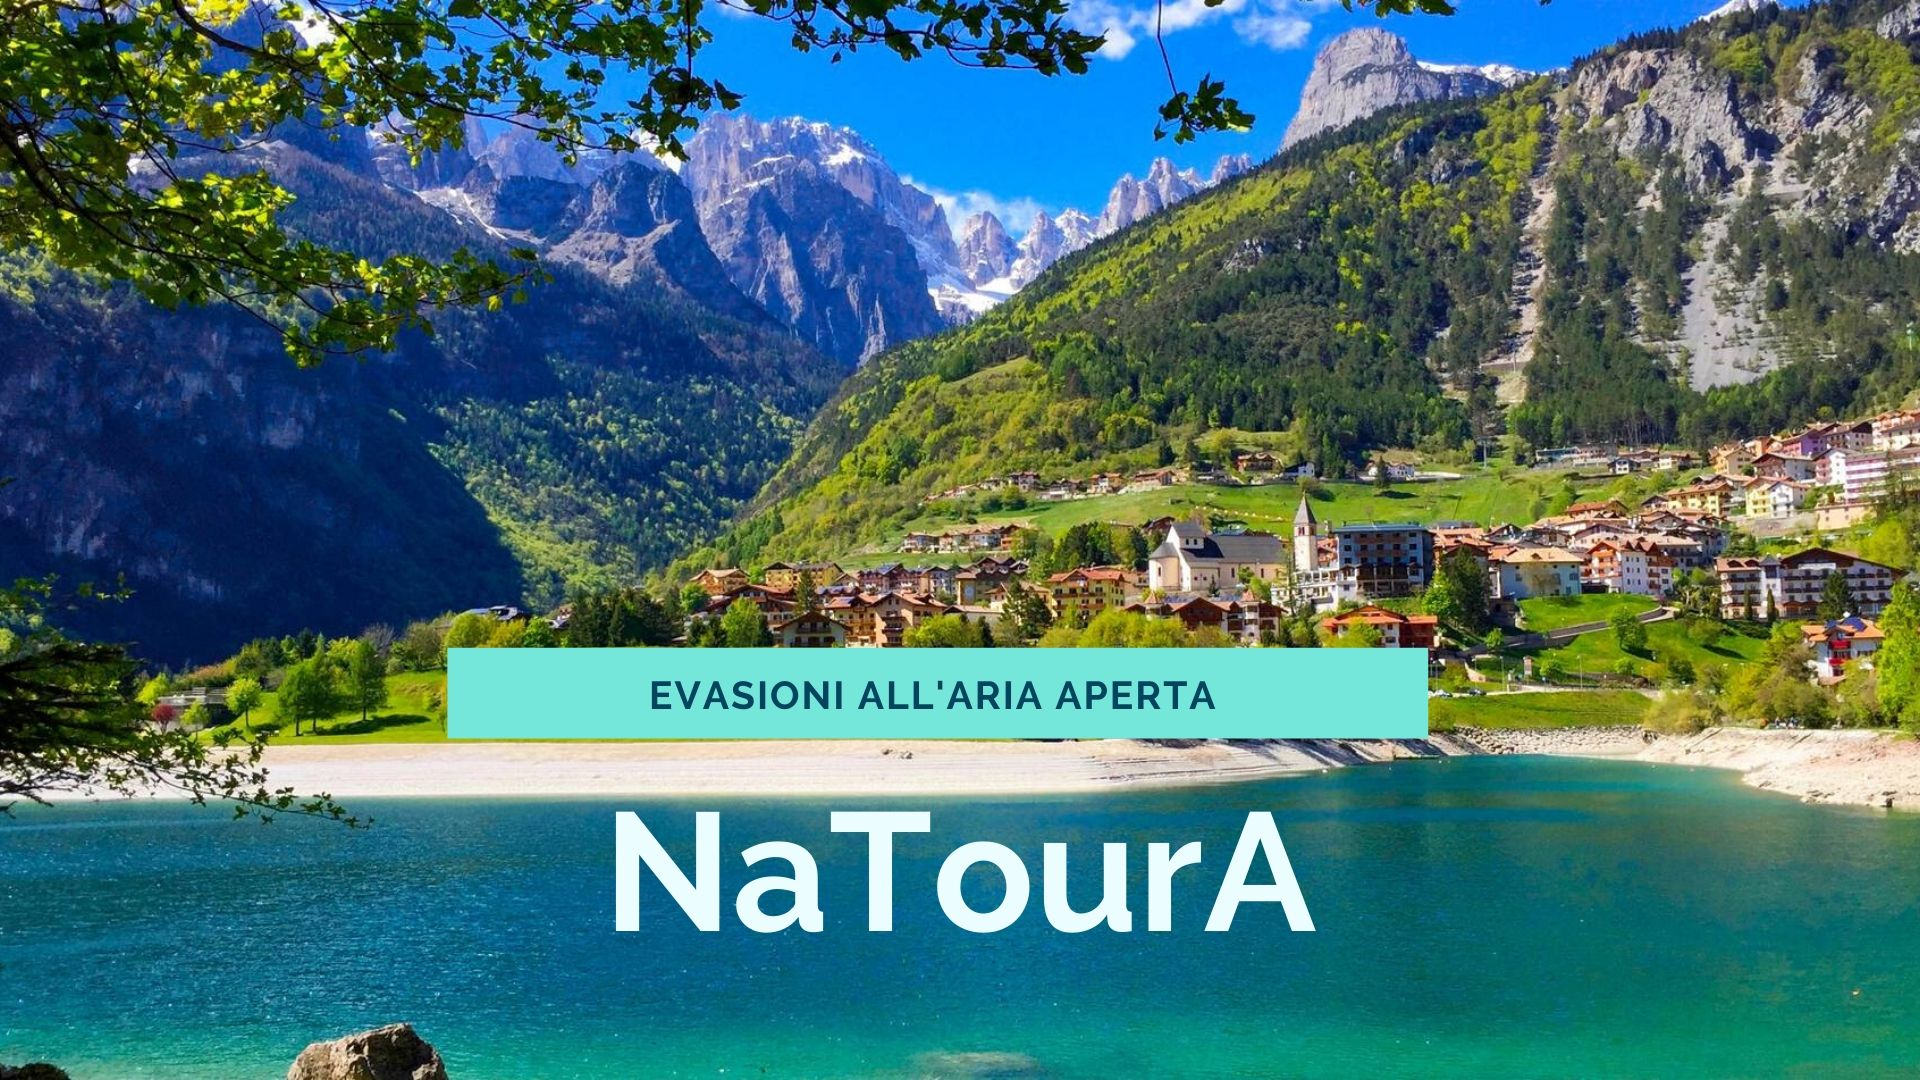 FALCINI VIAGGI - NaTourA